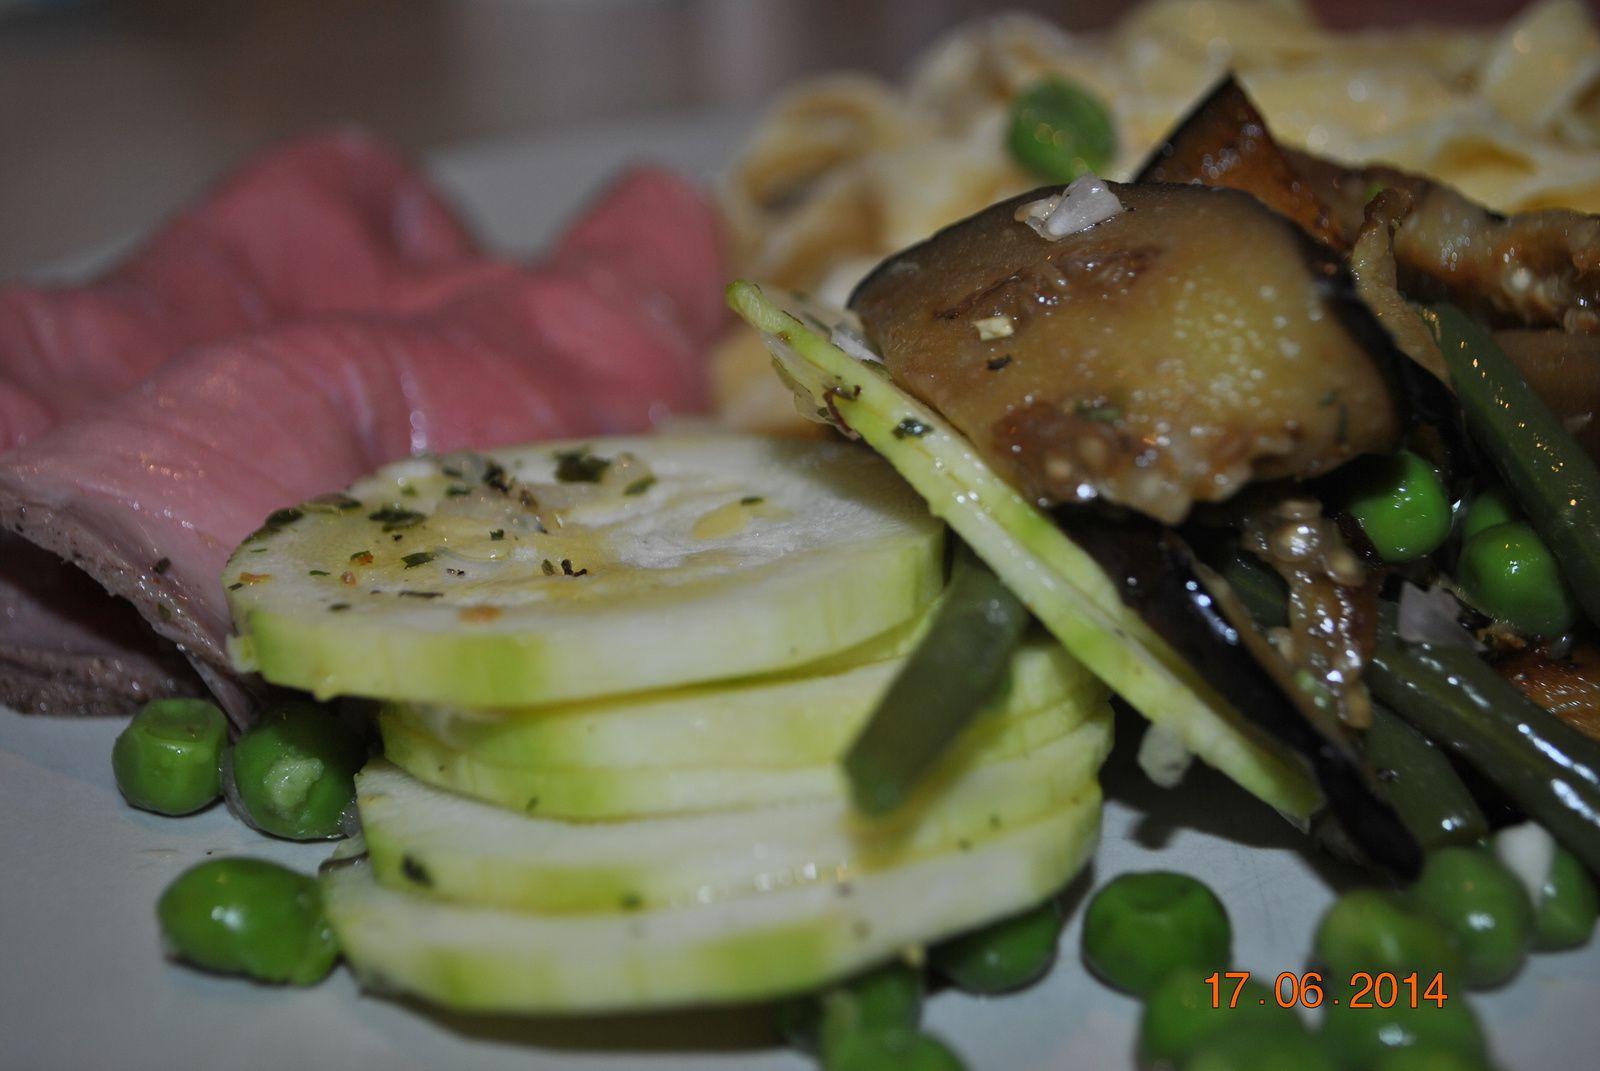 Rosbif et tagliatelles en salade, aux 3 légumes verts